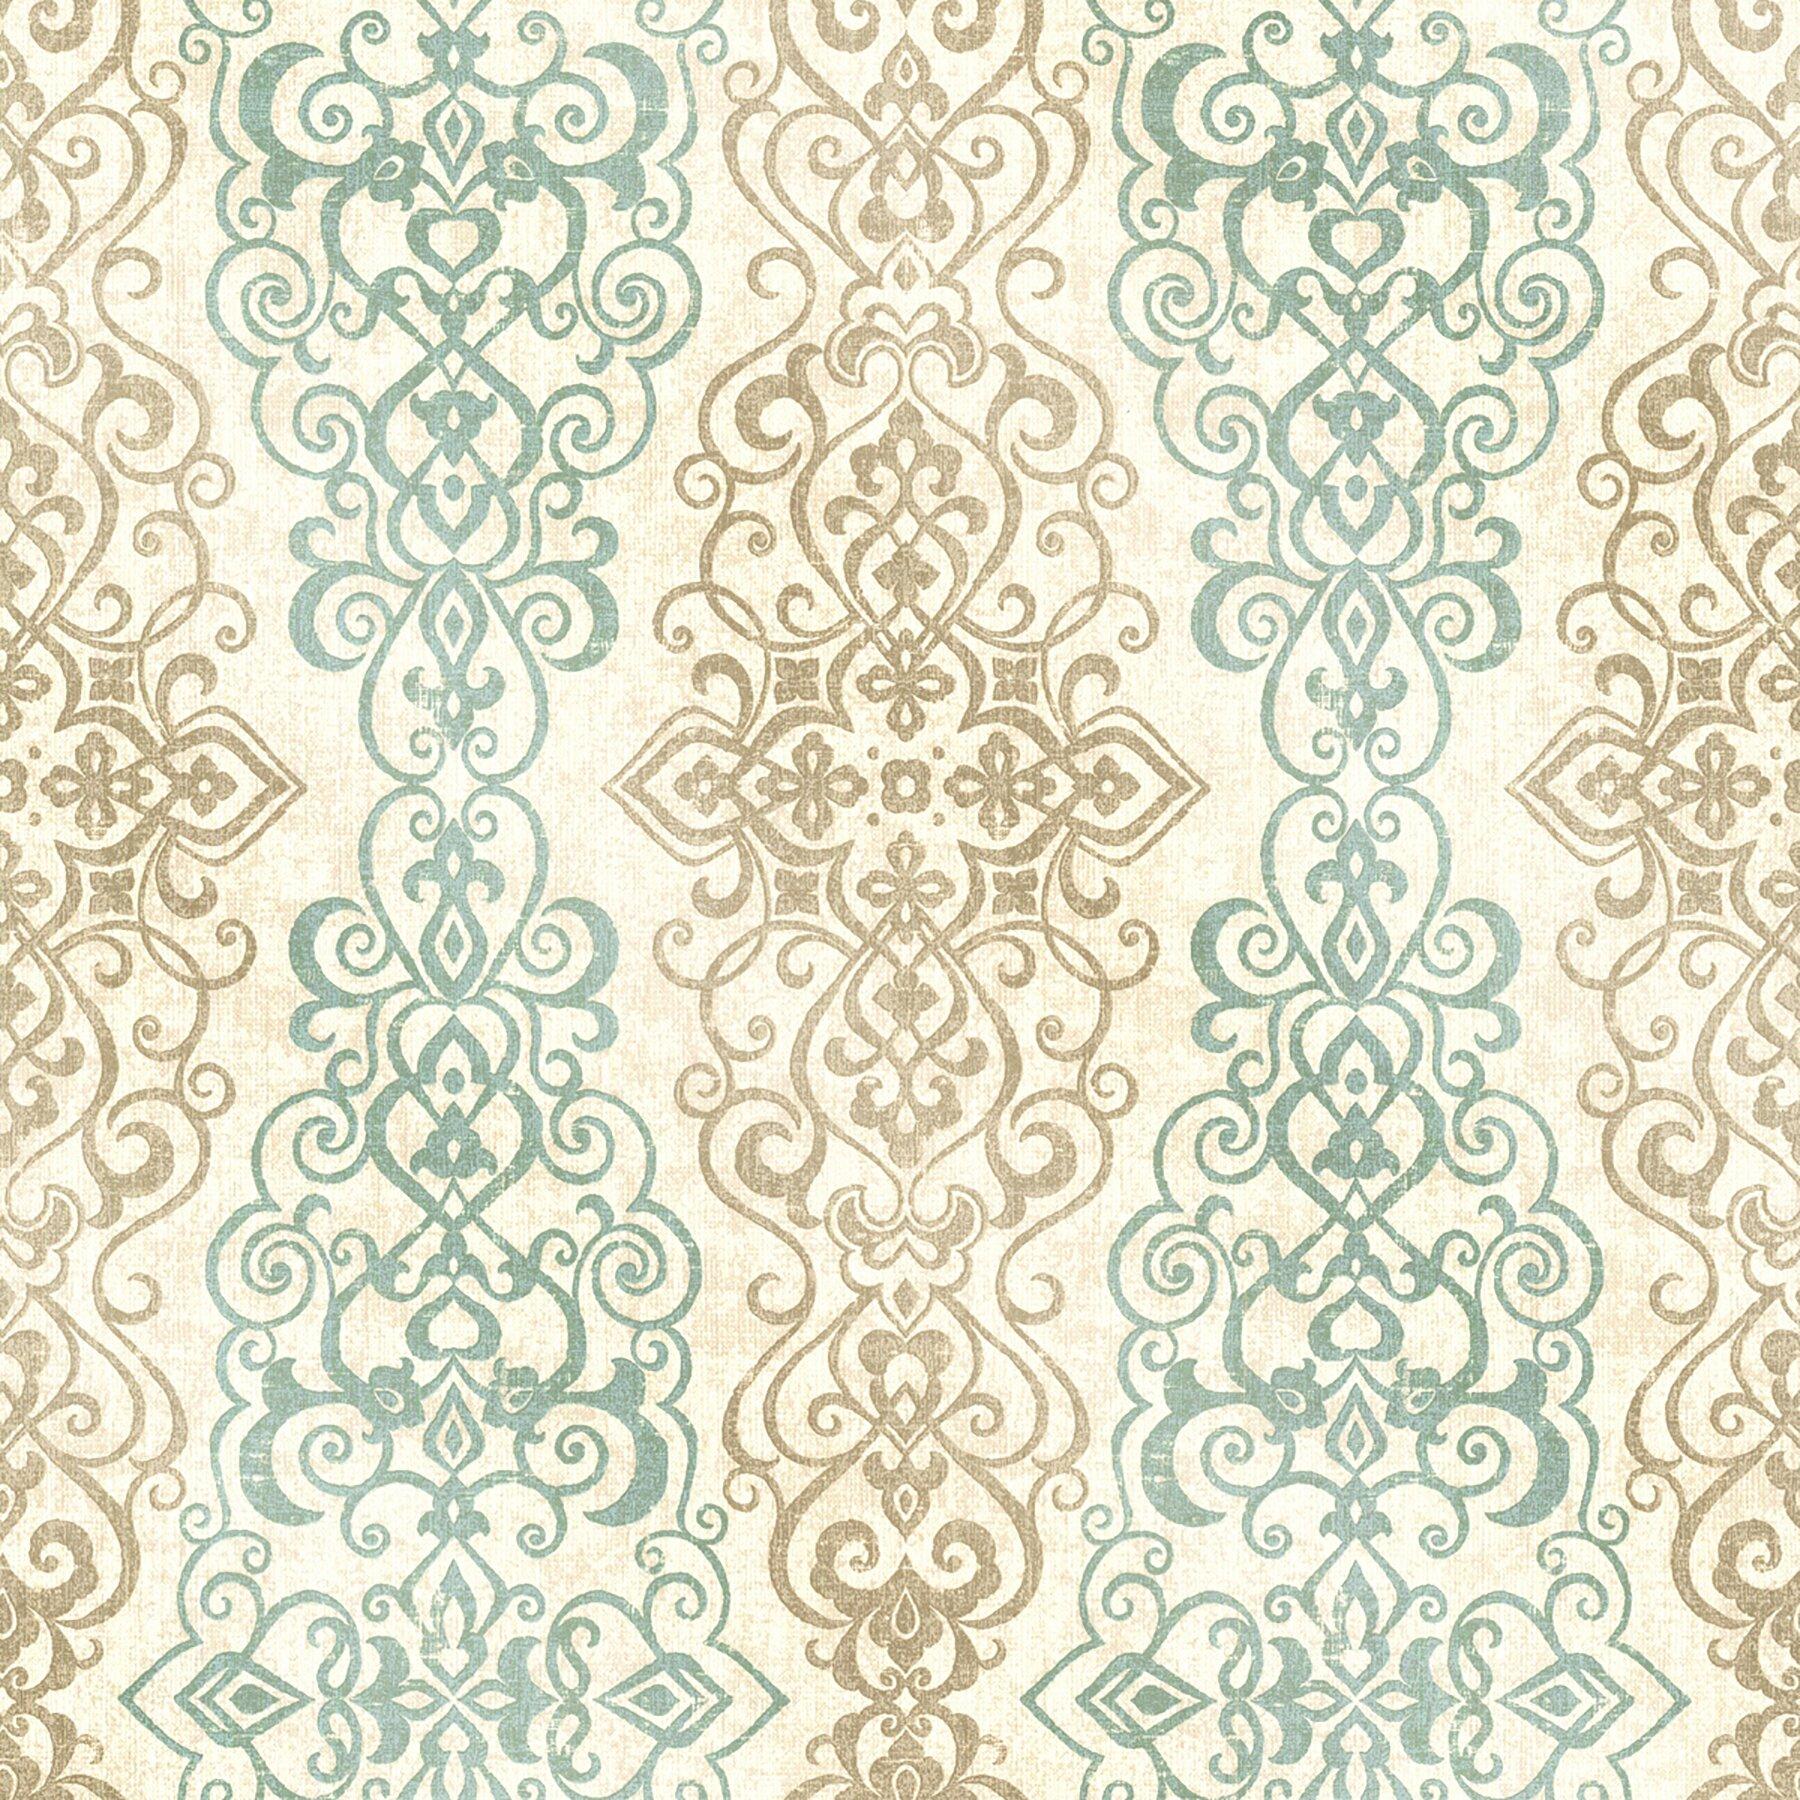 Brewster home fashions alhambra mexuar filigree 33 39 x 20 5 for 3d embossed wallpaper